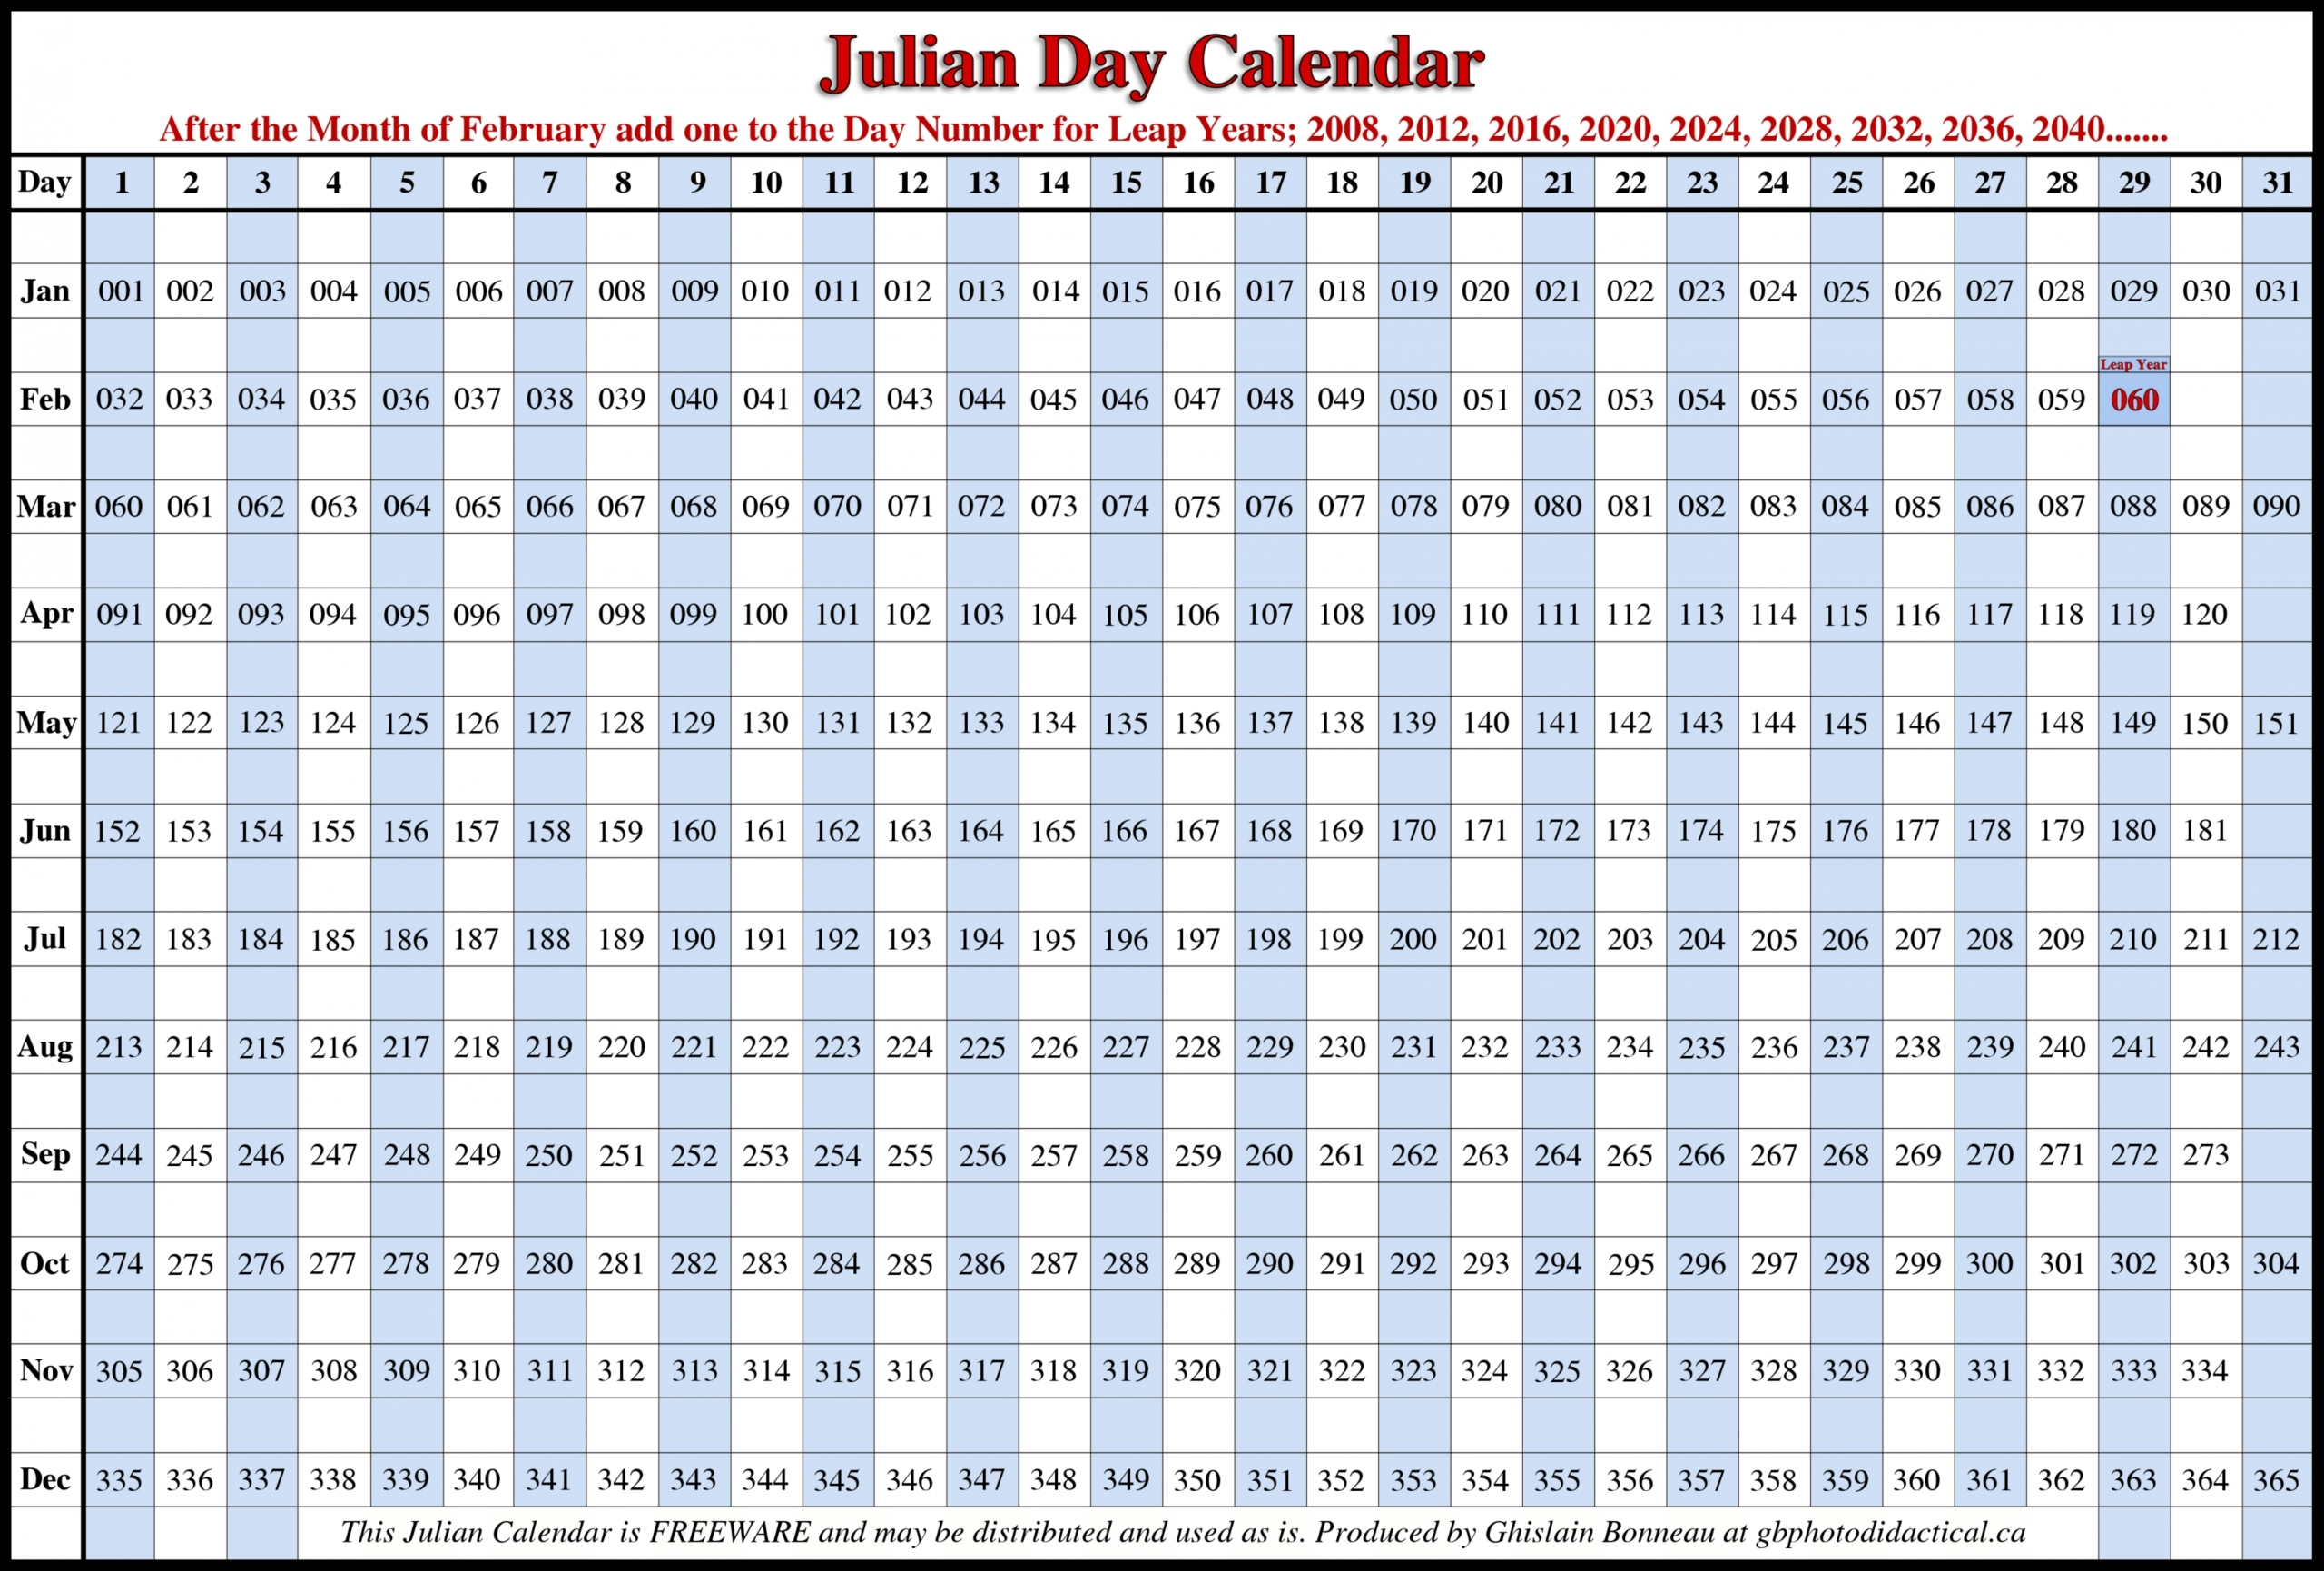 Free Printable Julian Date Calendar 2021 | Julian Dates